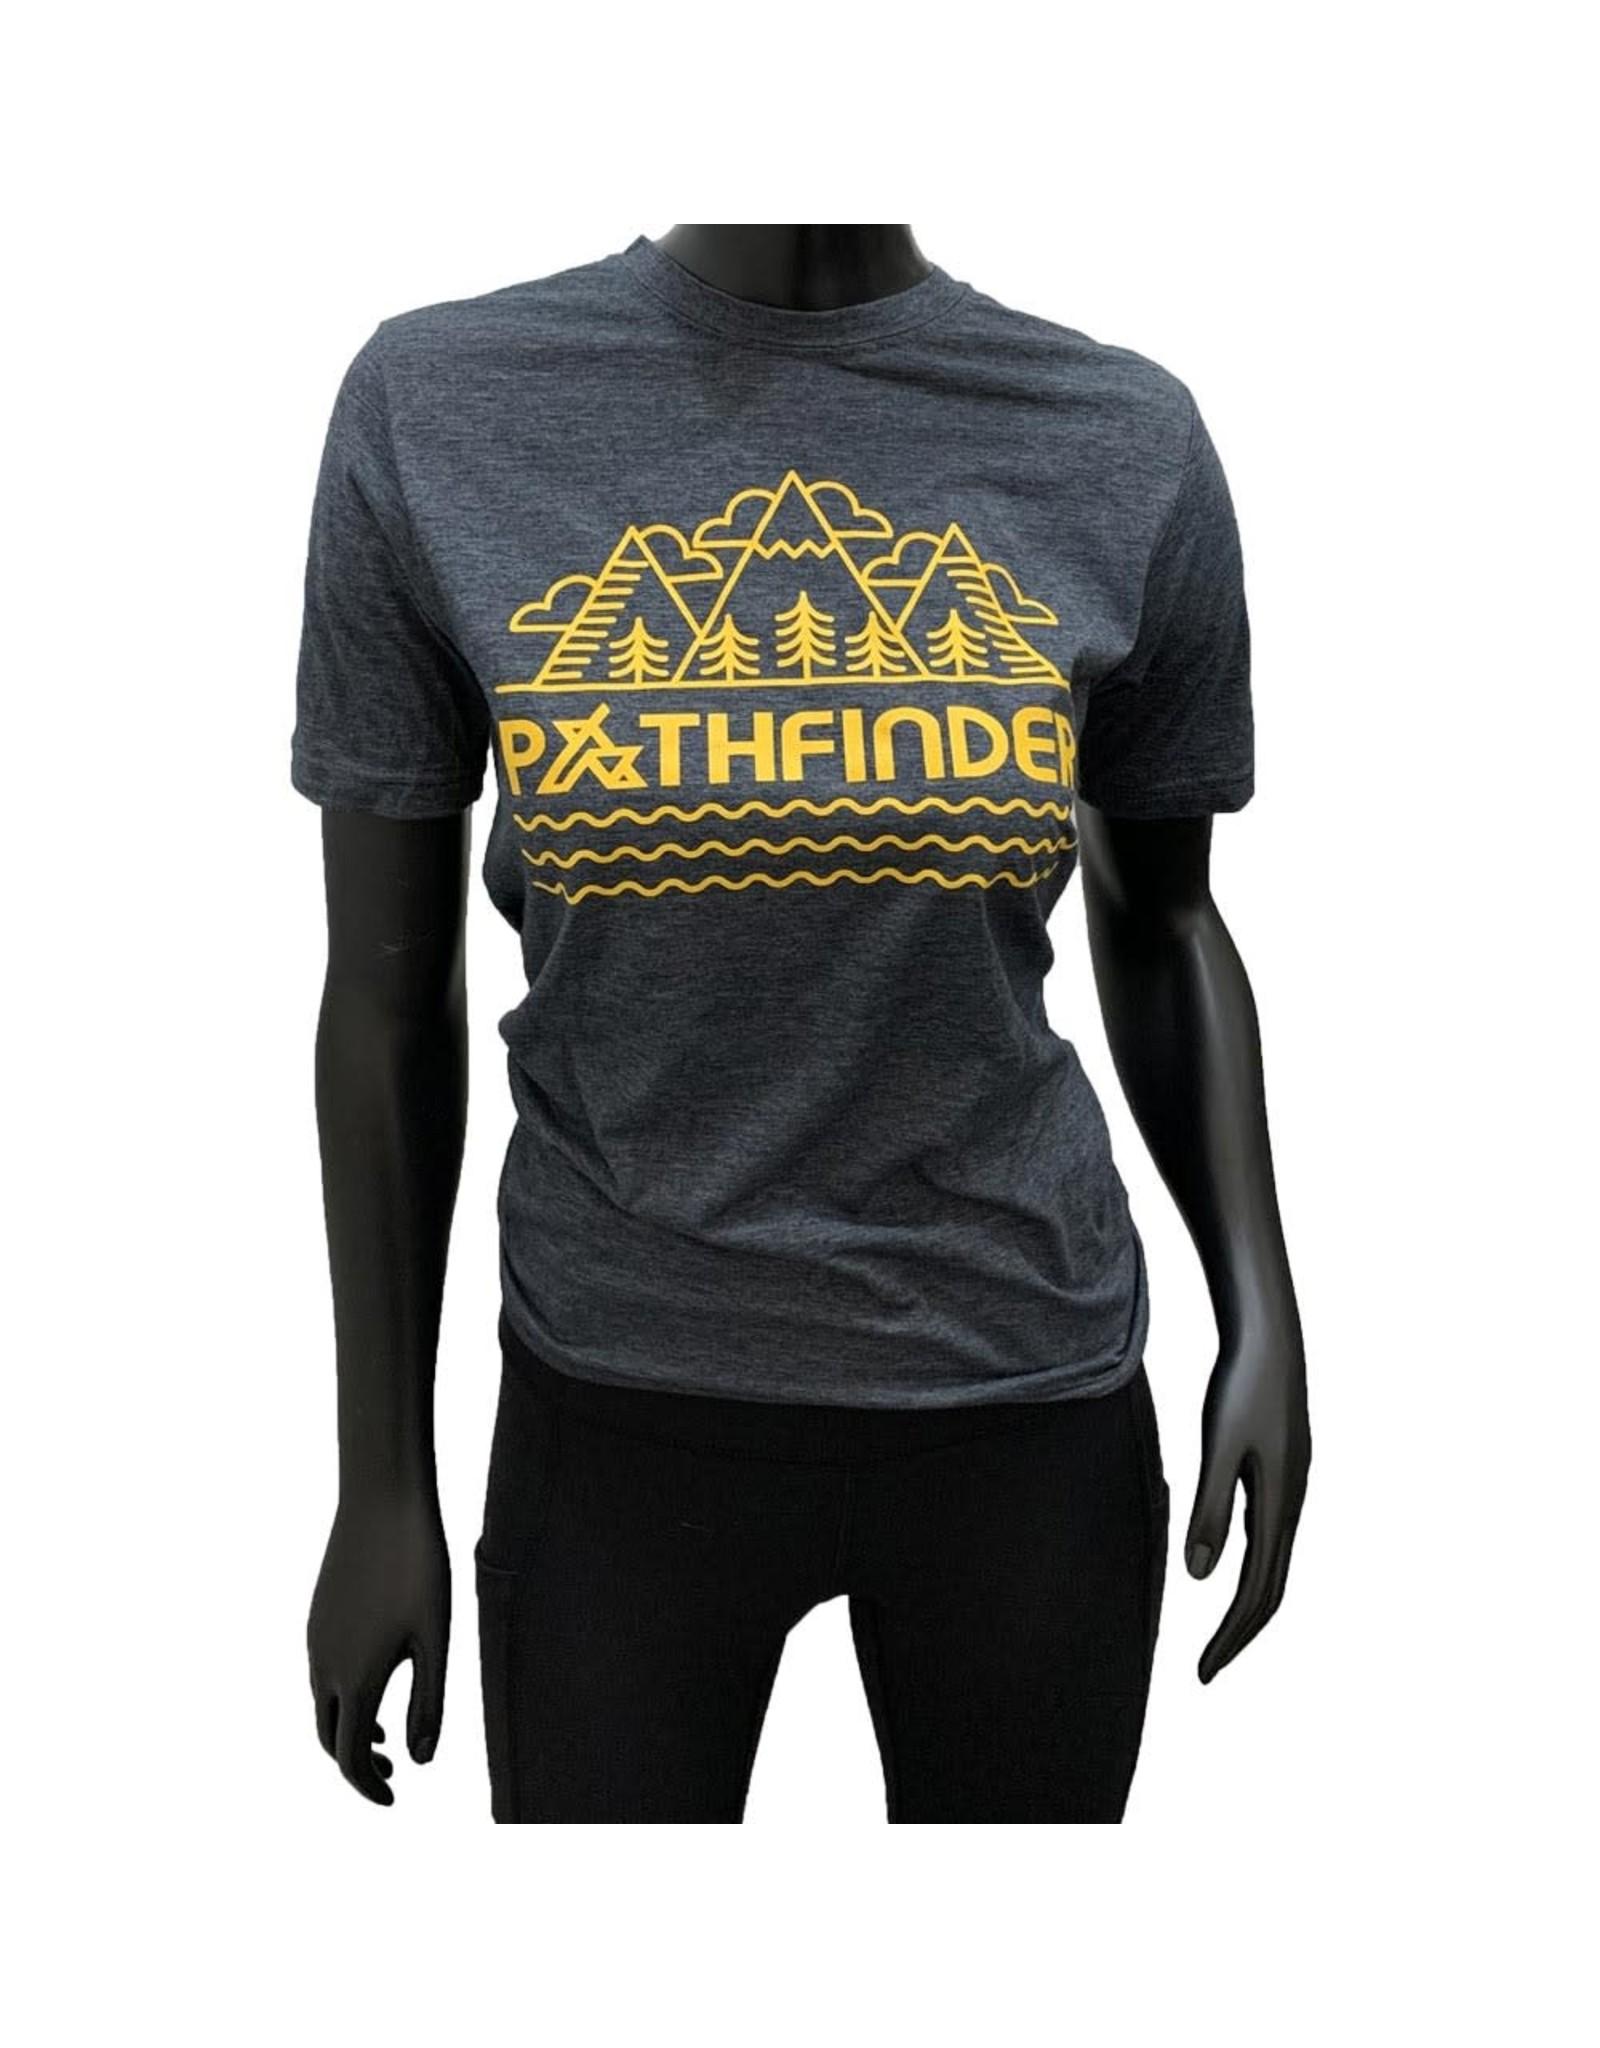 Pathfinder Mountain Poly/Cotton Crew Tee Antique Denim/Gold